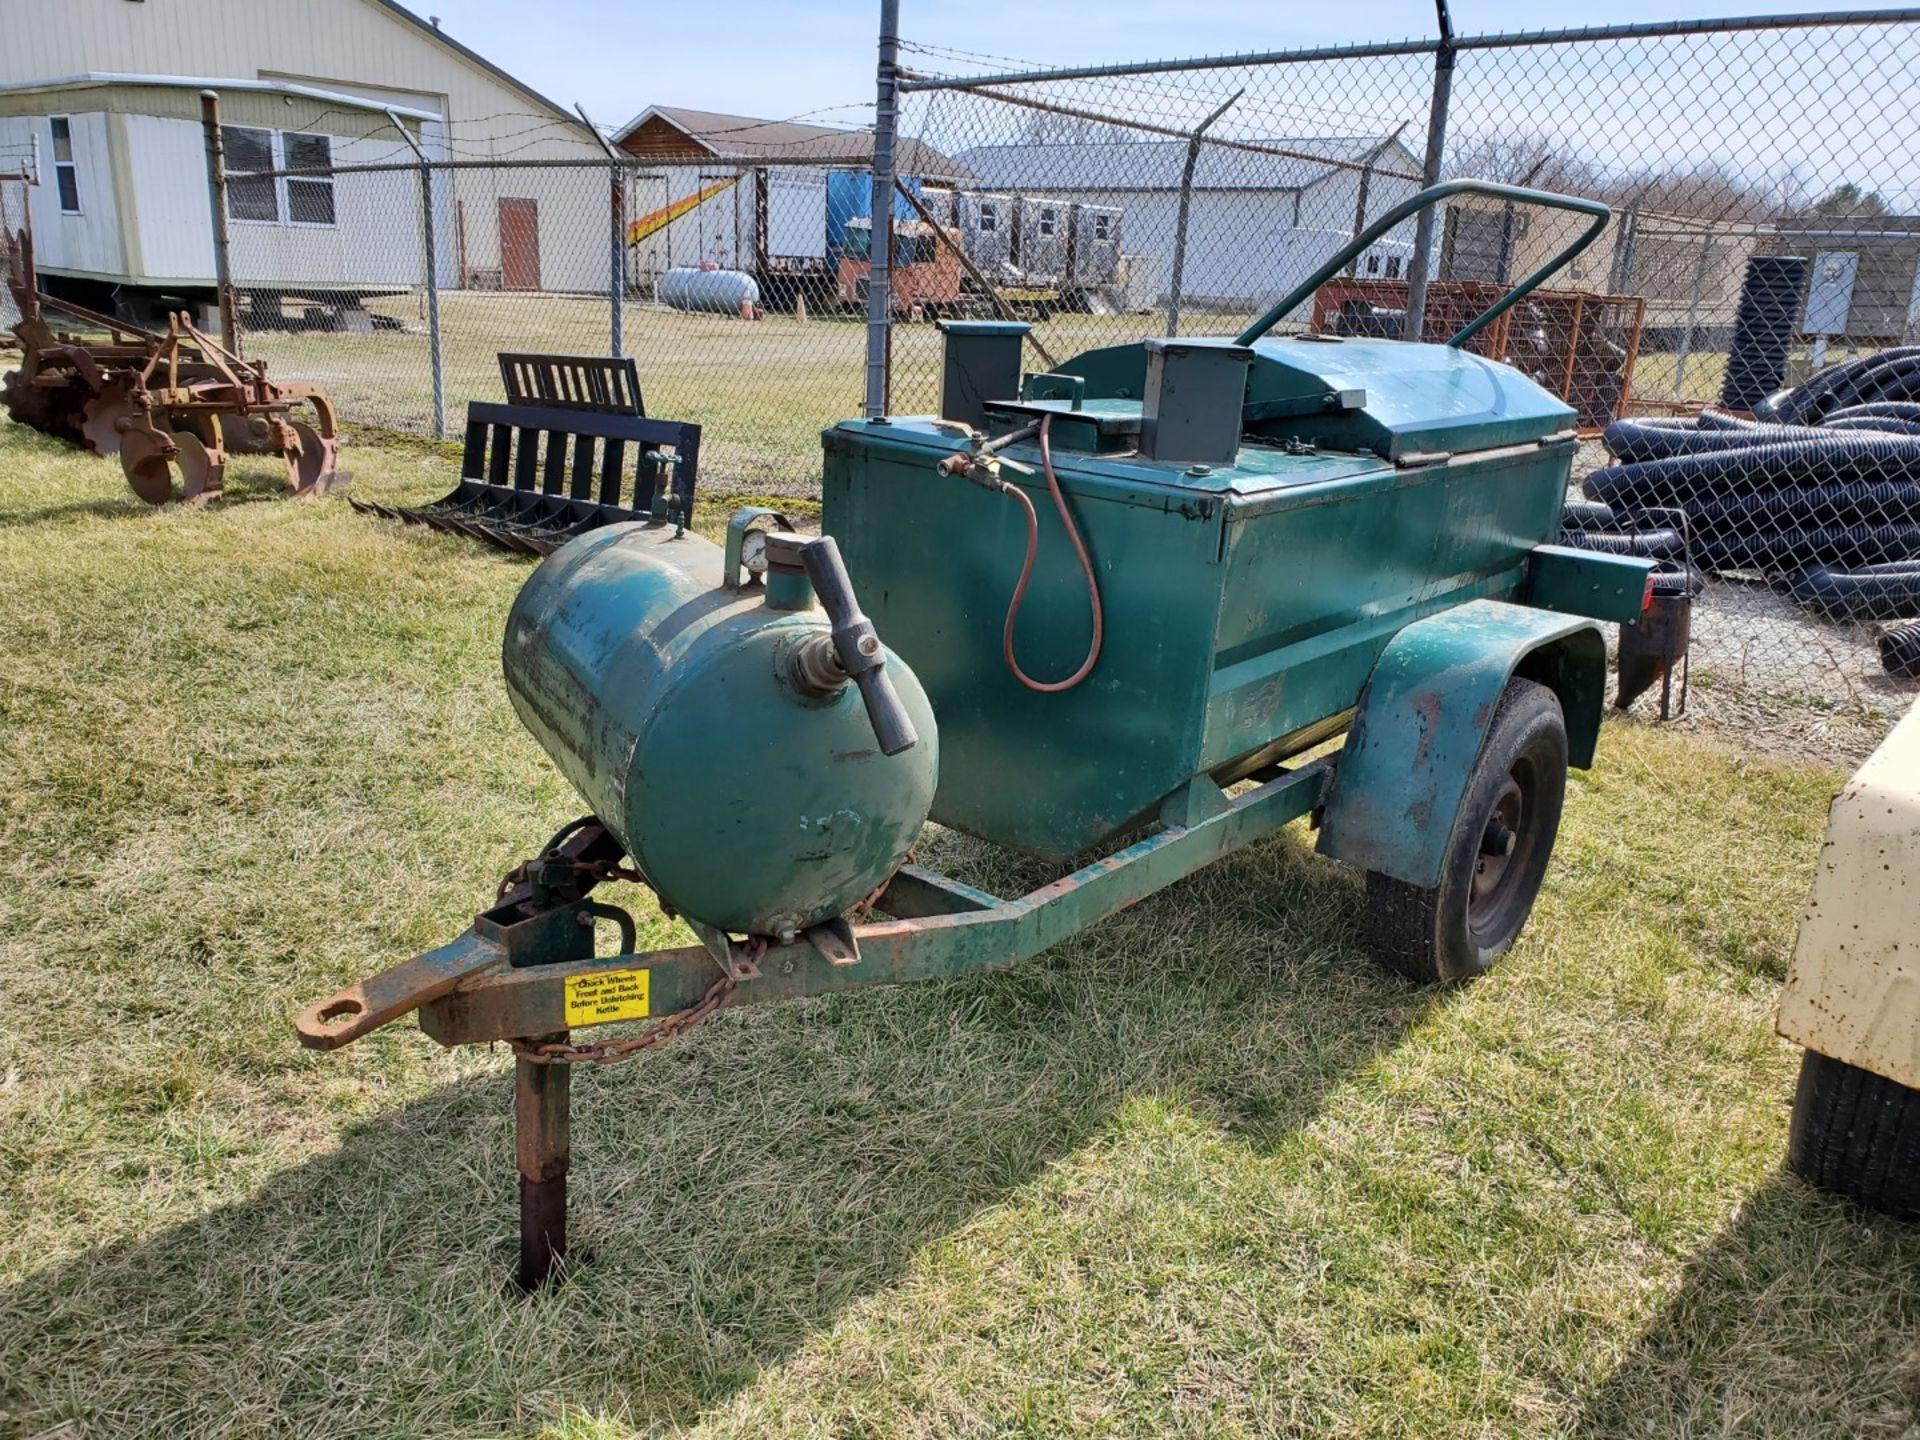 Lot 5 - Reeves Model B140 LP, 2 Burner Tar Kettle